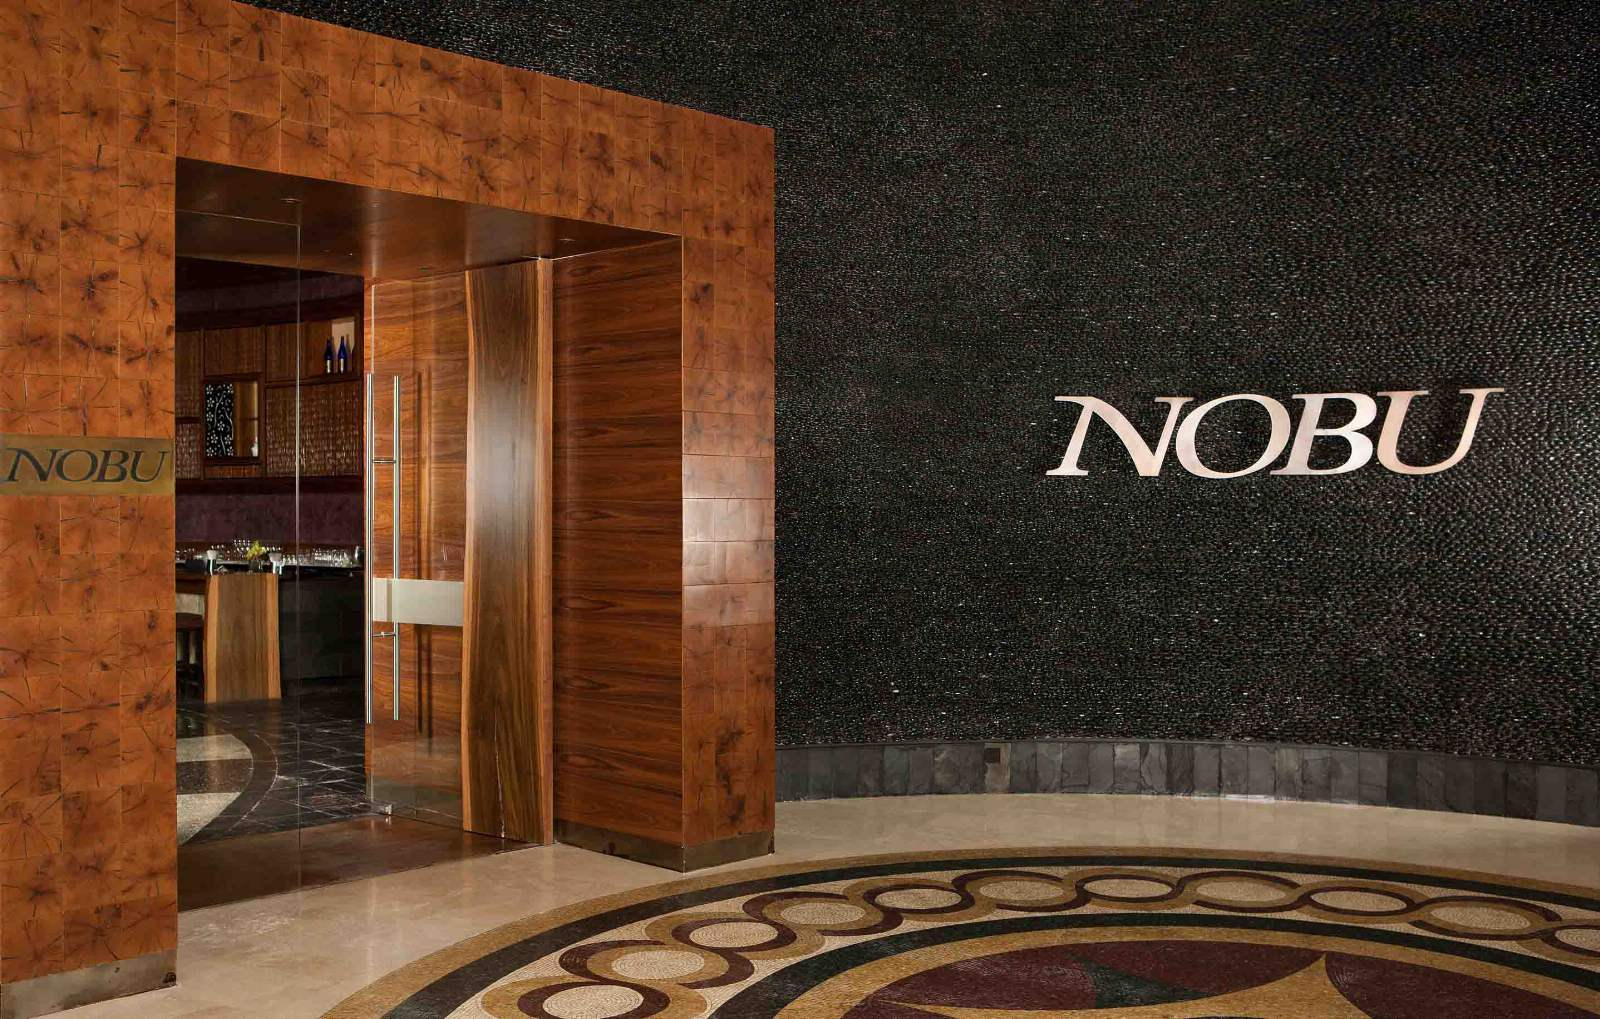 Atlantis, The Palm - Nobu Restaurant